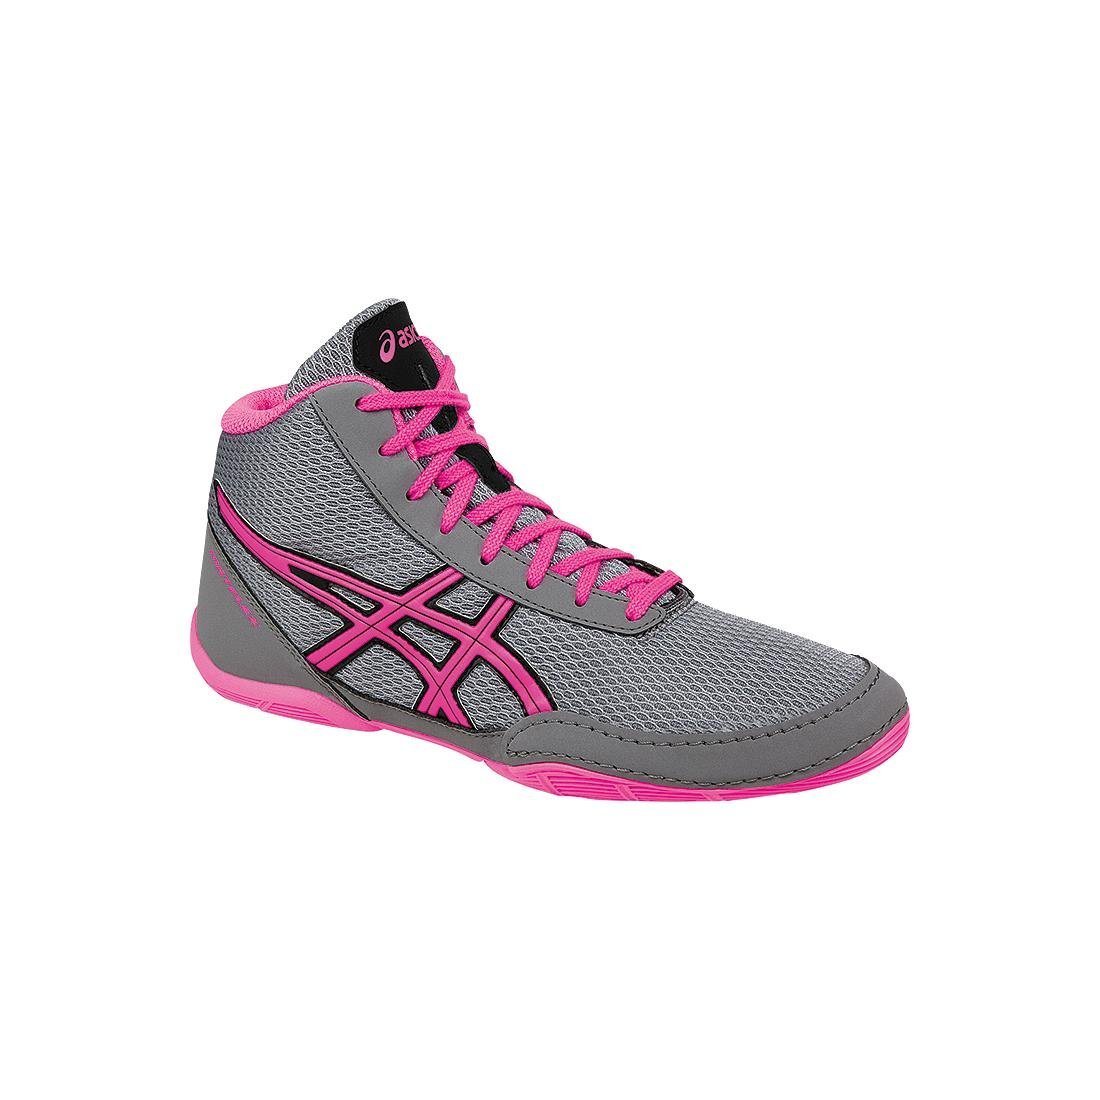 ASICS Matflex 5 GS Skate Shoe (Little Kid/Big Kid), Aluminum/Hot Pink/Black, 11